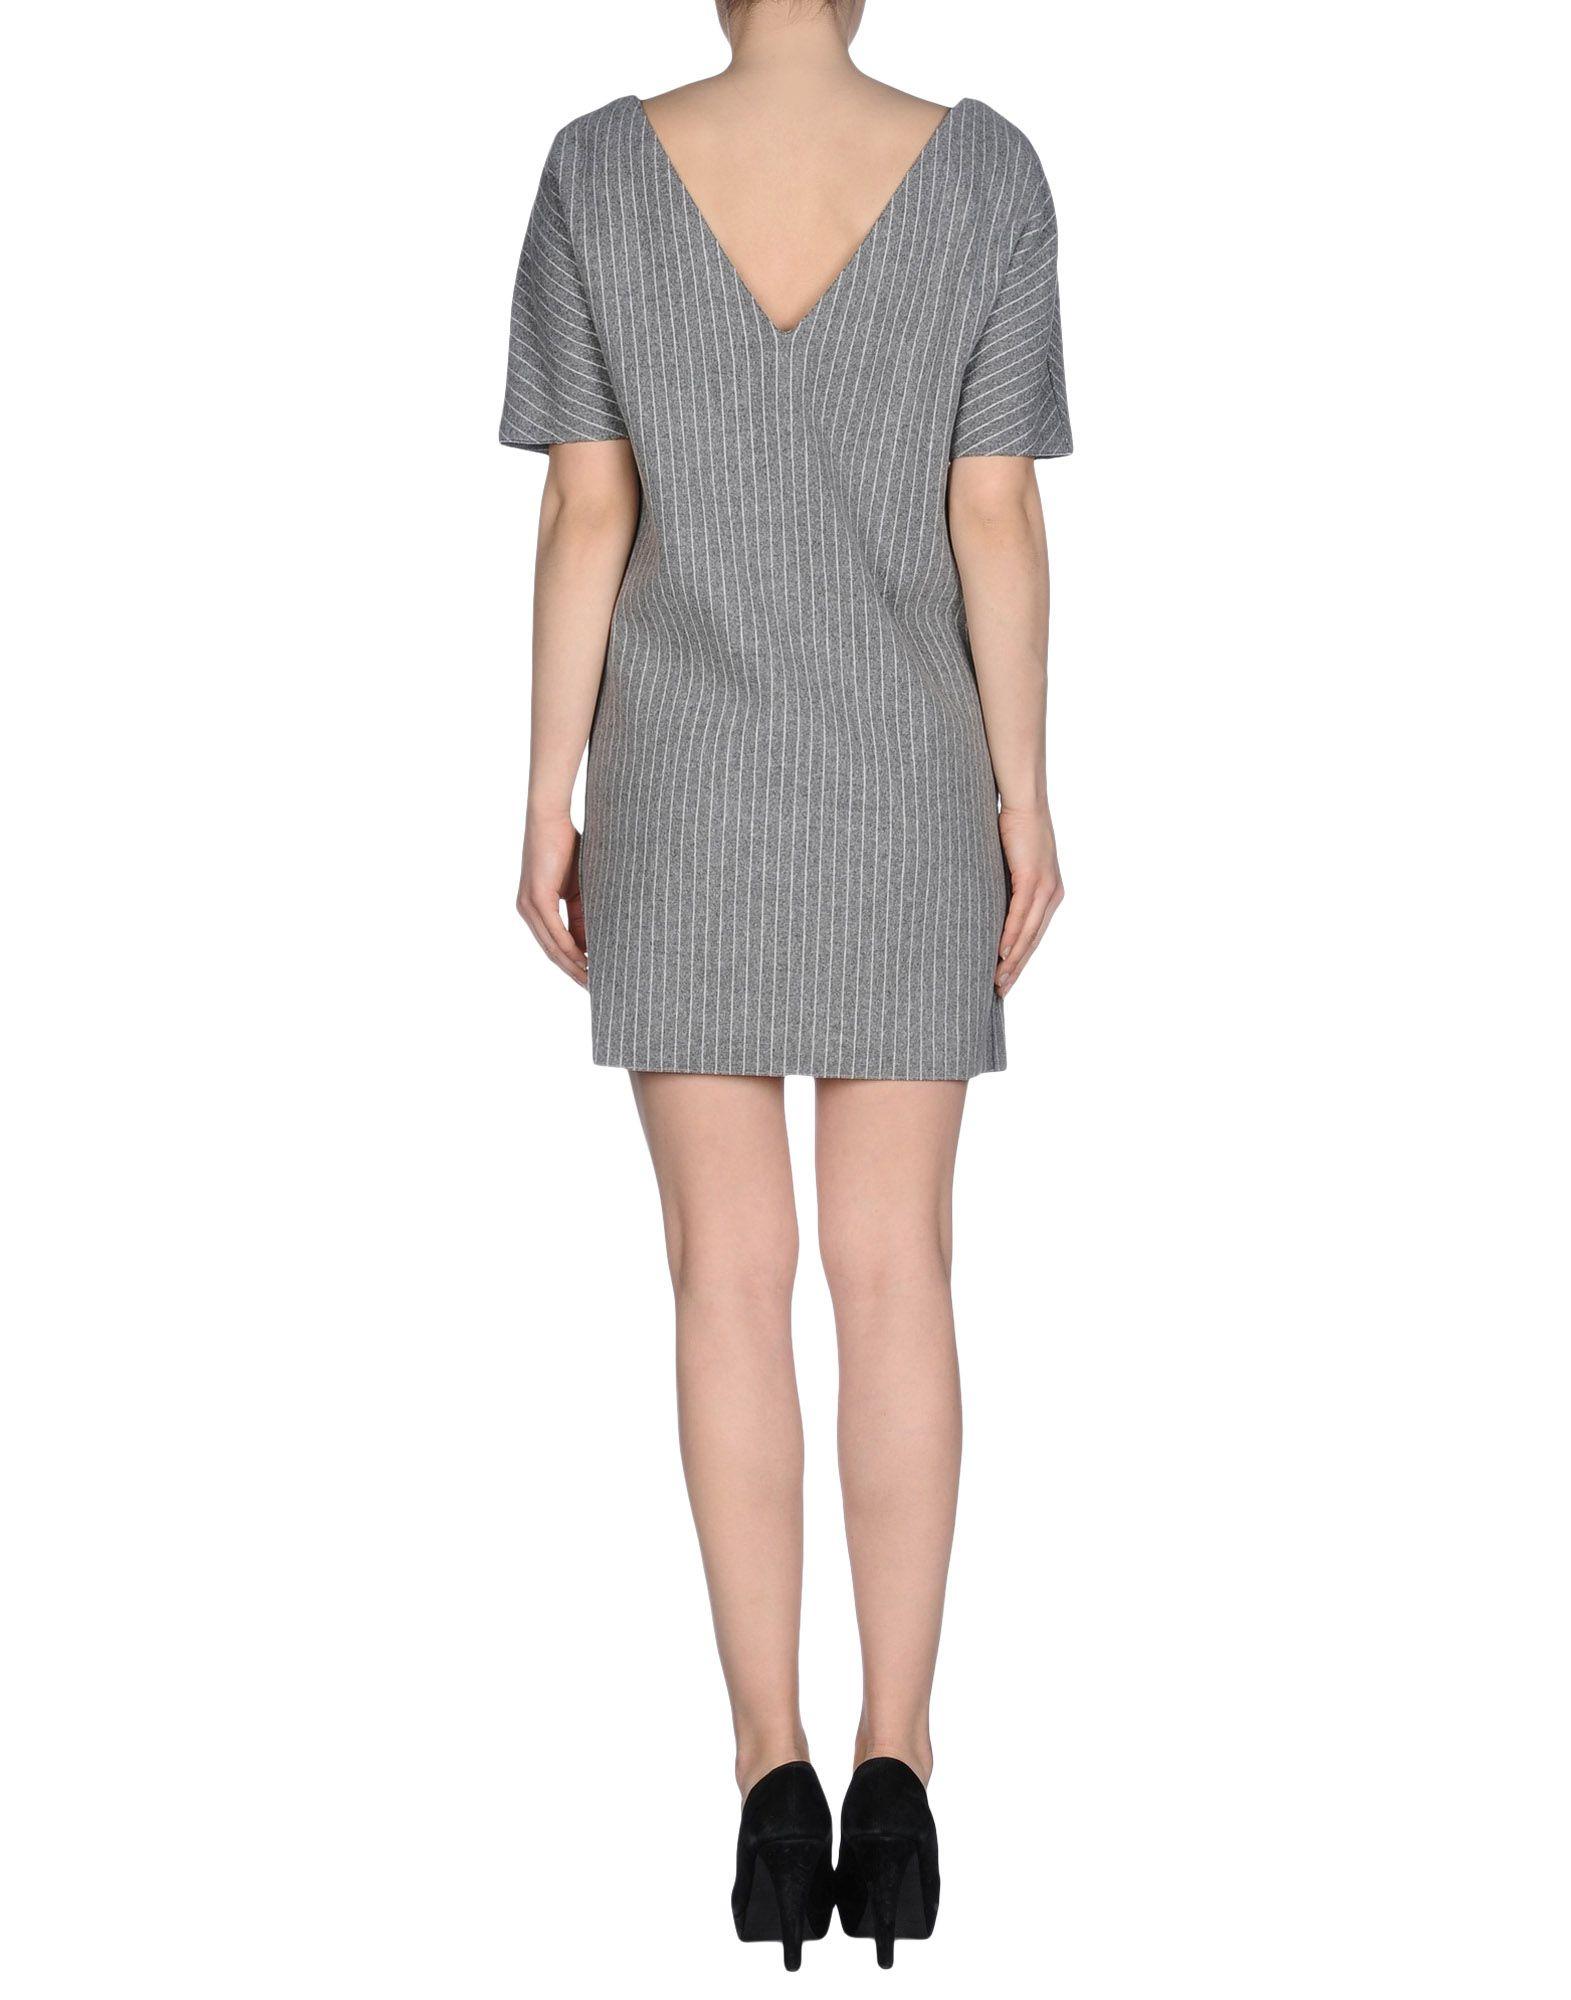 DRESSES - Short dresses Mauro Grifoni Reliable For Sale Footlocker For Sale qZDJK